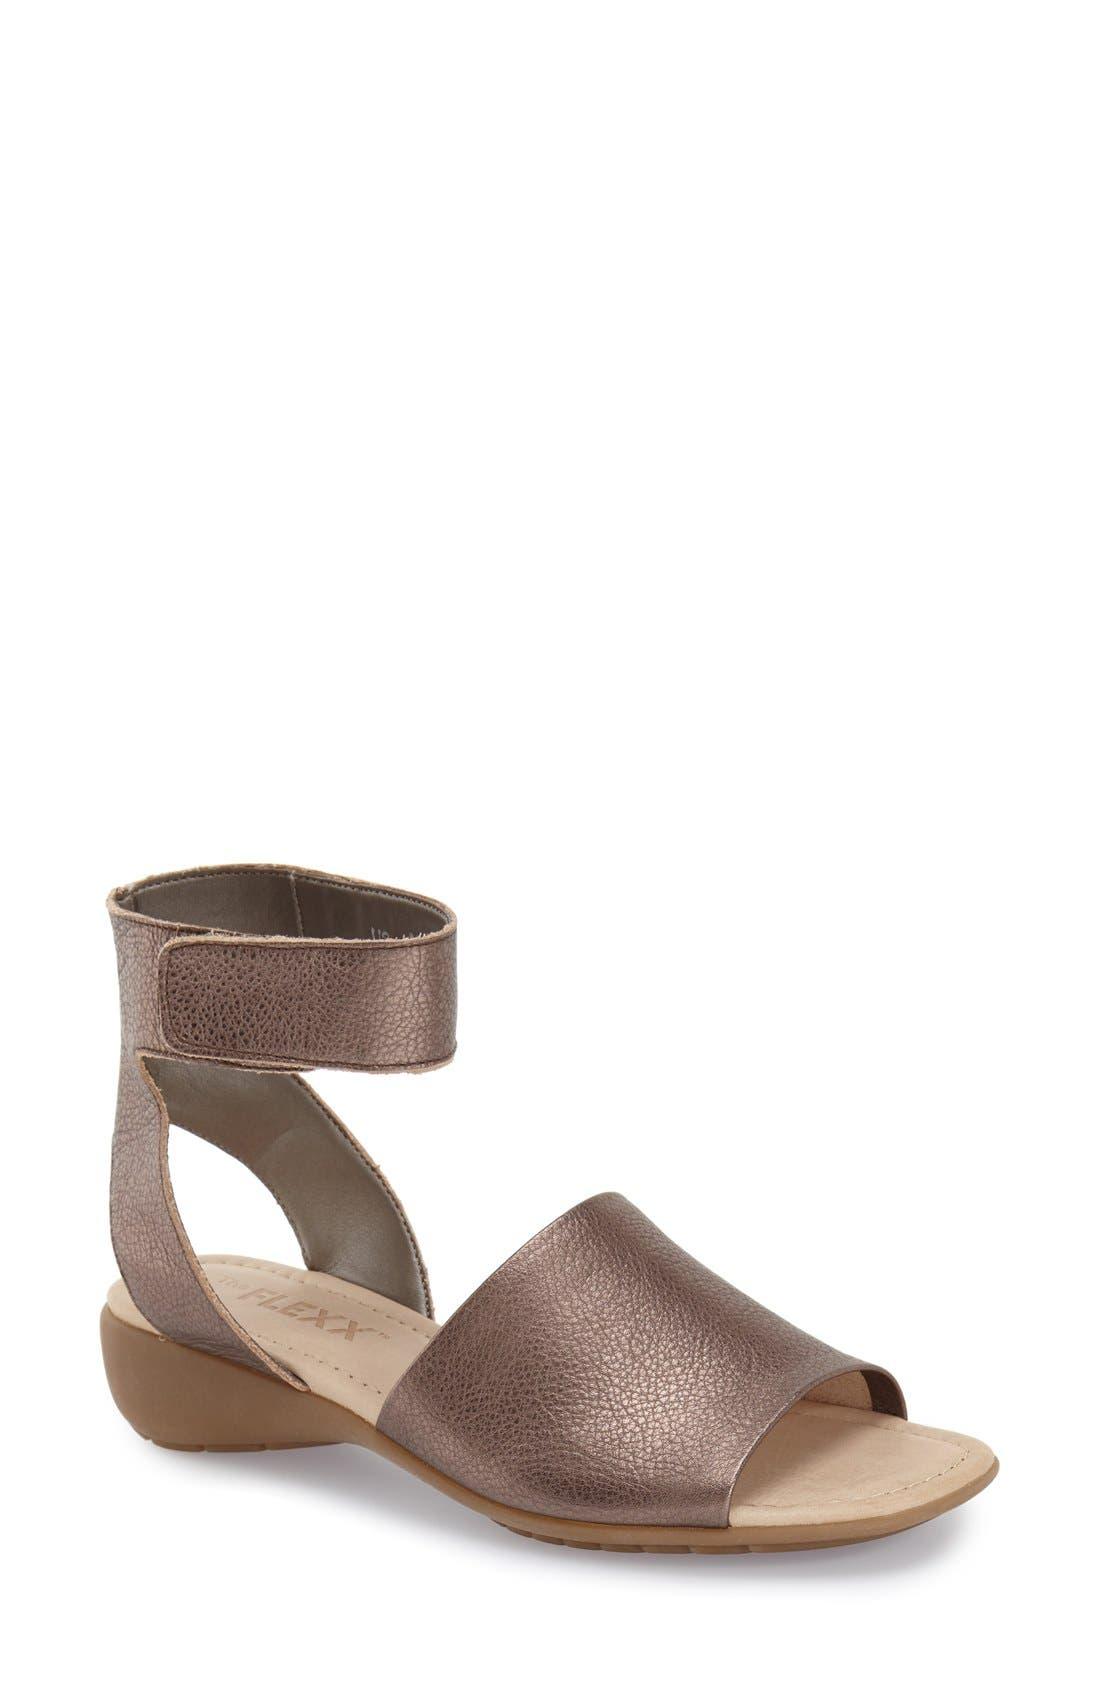 'Beglad' Leather Ankle Strap Sandal,                             Main thumbnail 8, color,